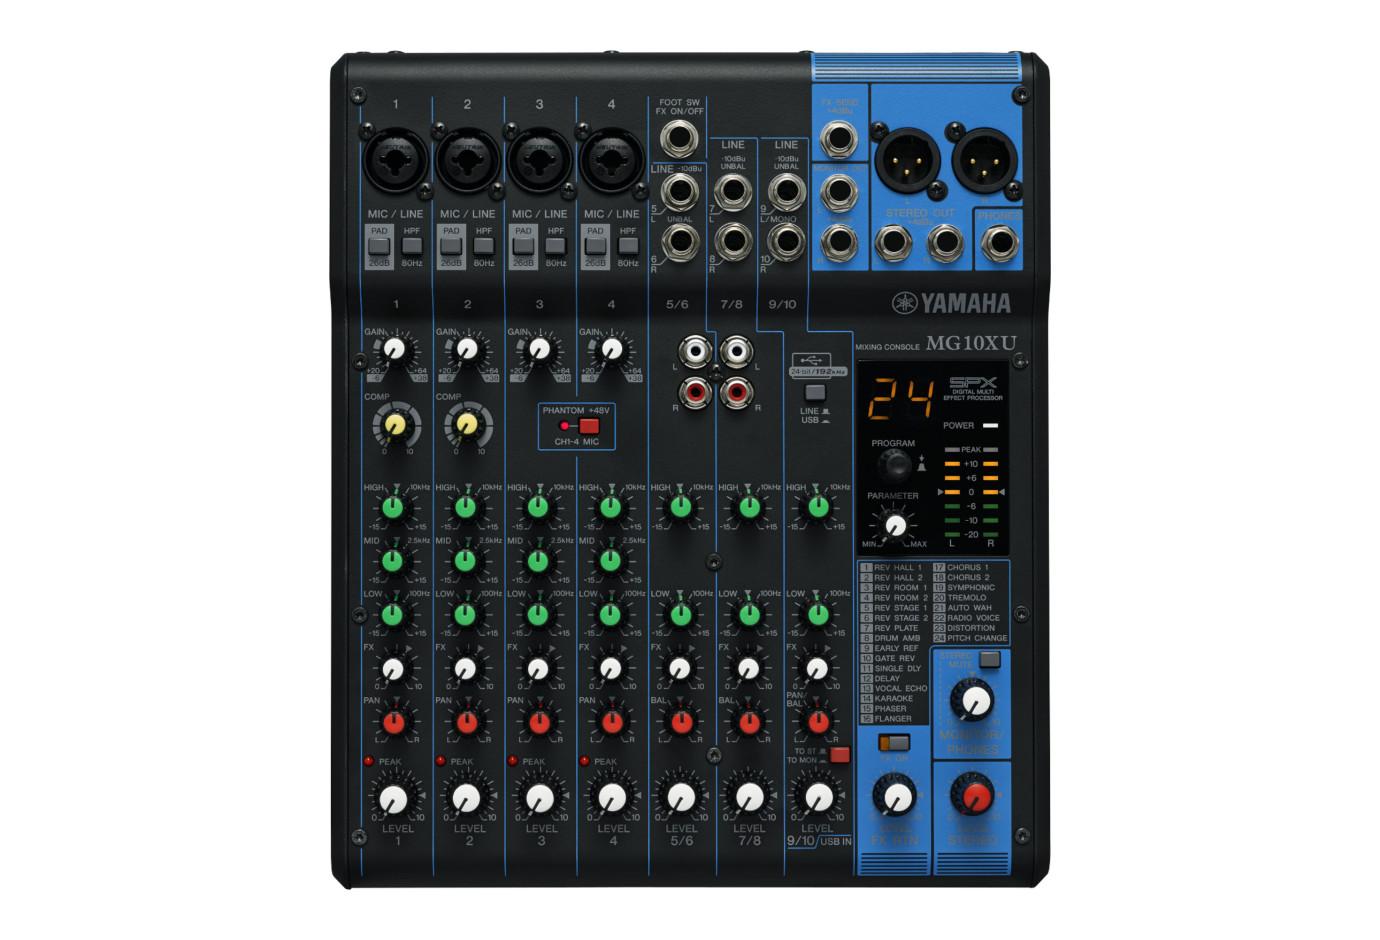 Yamaha mg10xu 10 input mixer w compression effects and usb for Yamaha mg10xu usb cable